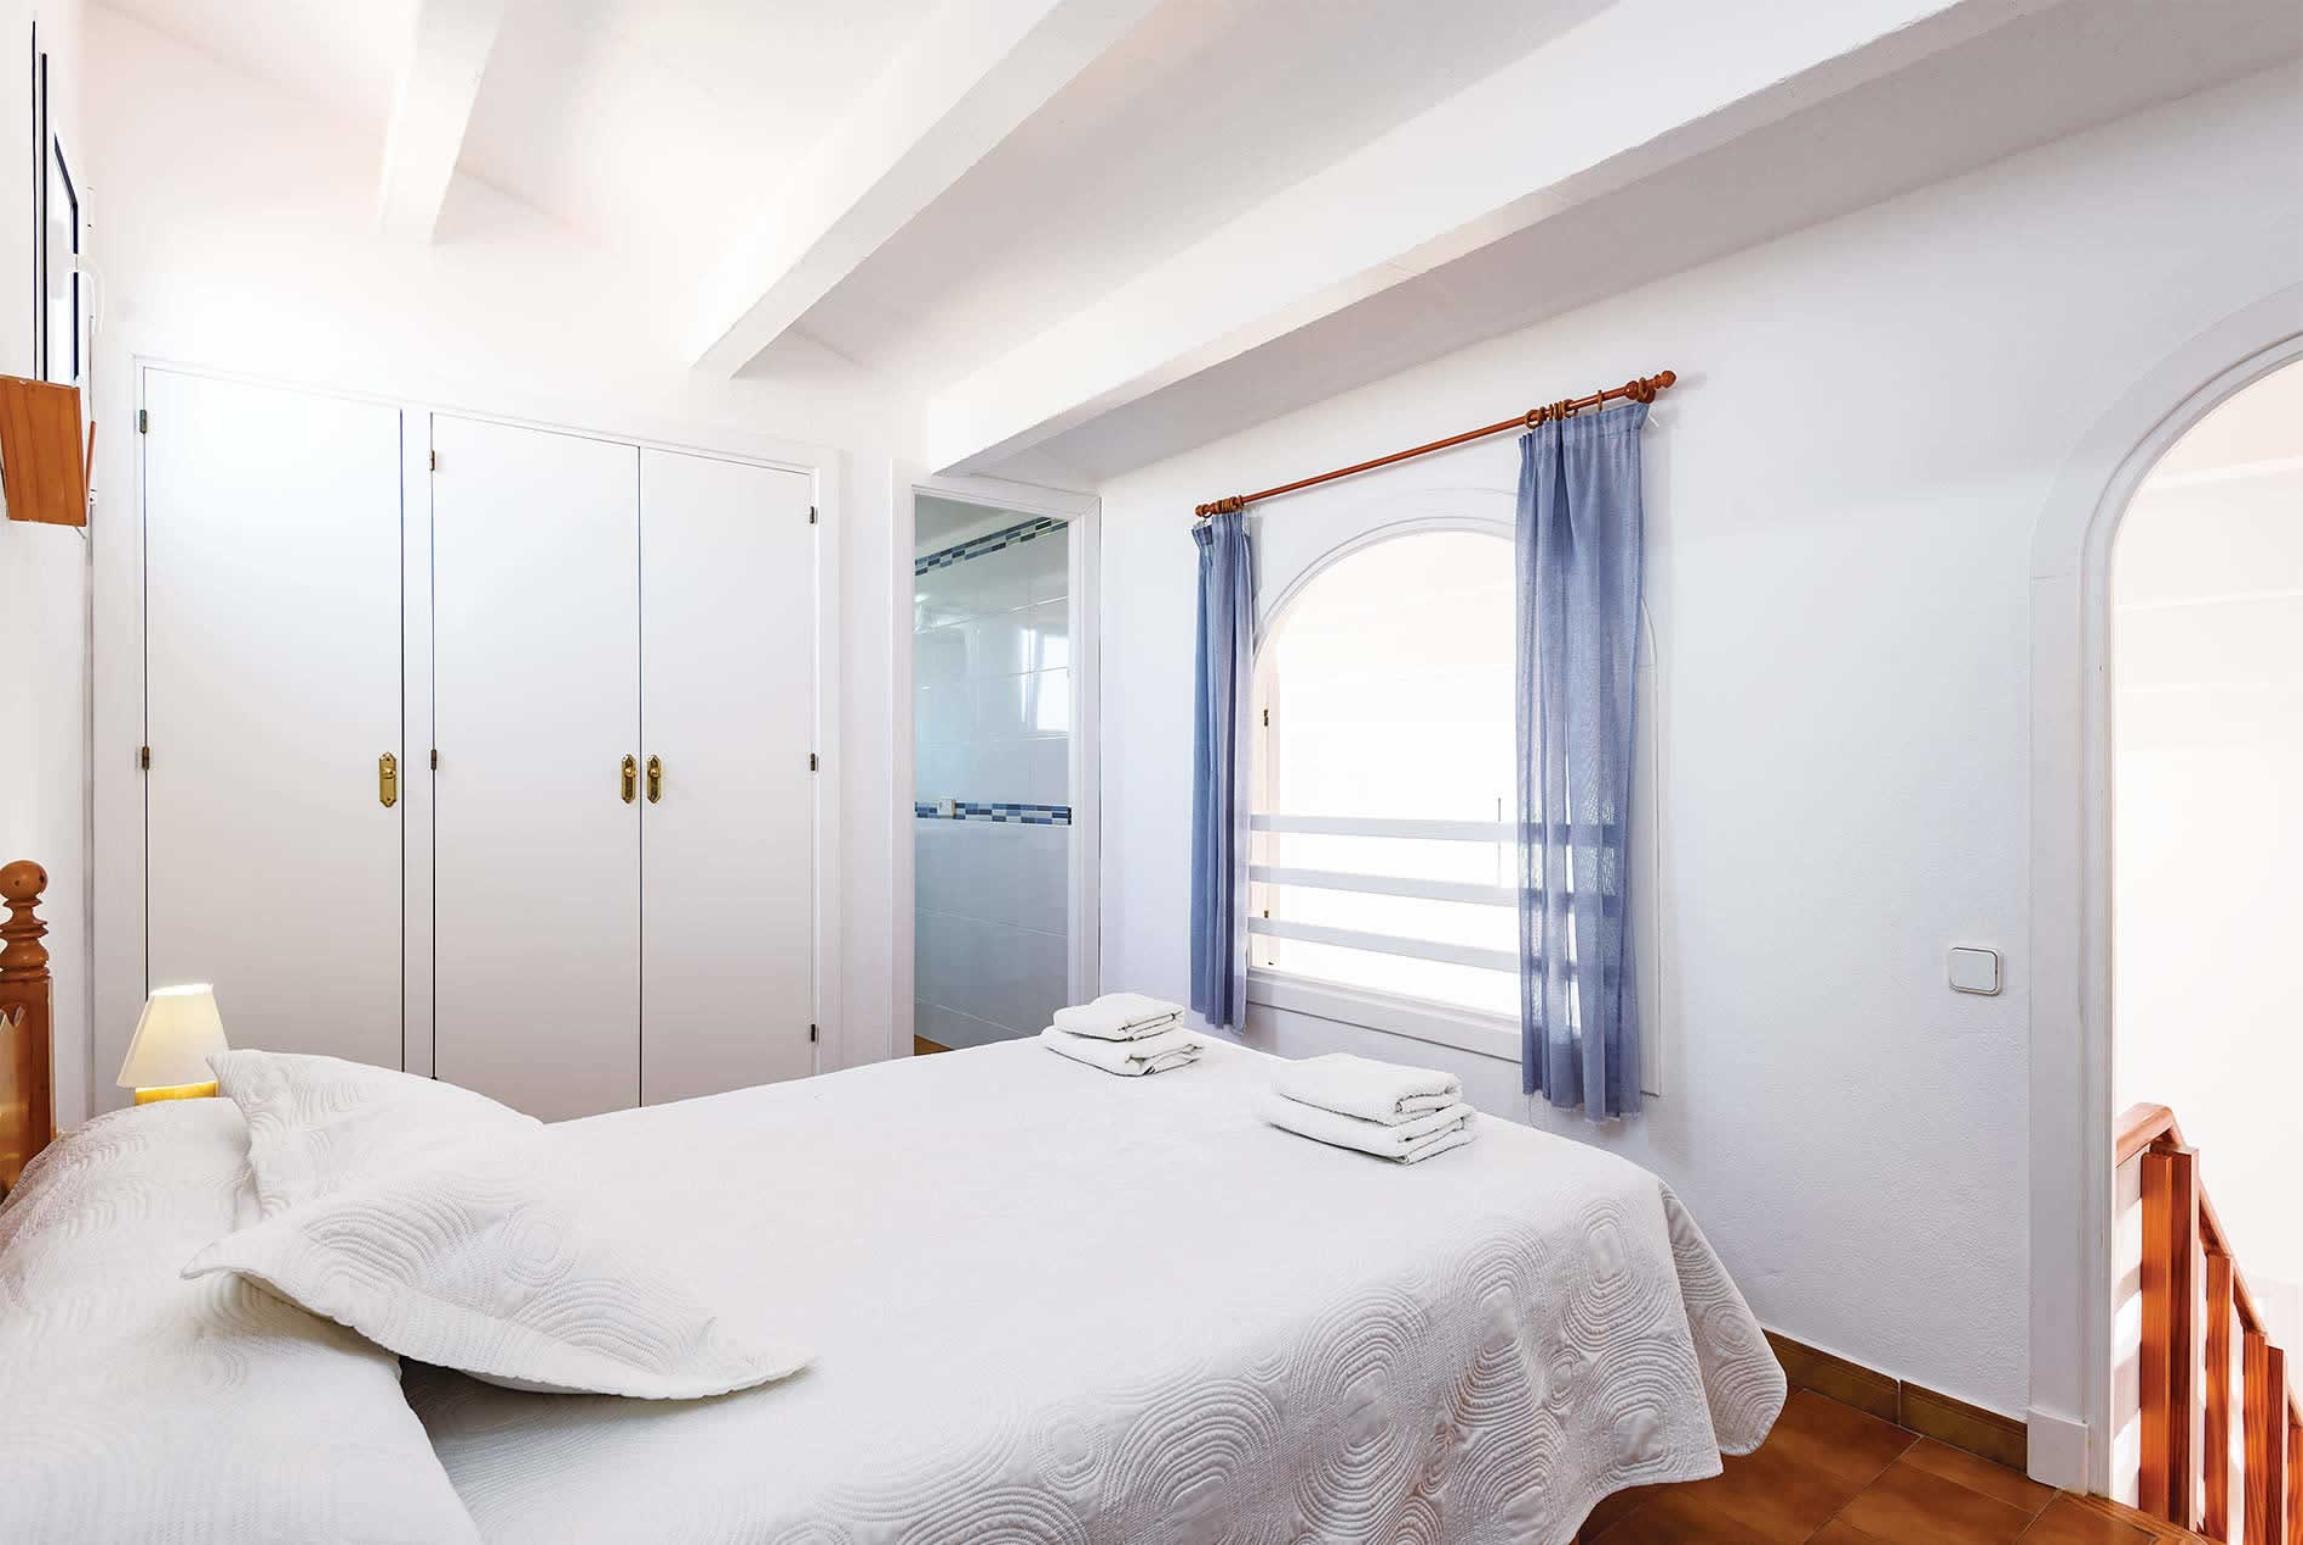 Ferienhaus Eulalia II (2653368), Arenal De'N Castell, Menorca, Balearische Inseln, Spanien, Bild 6